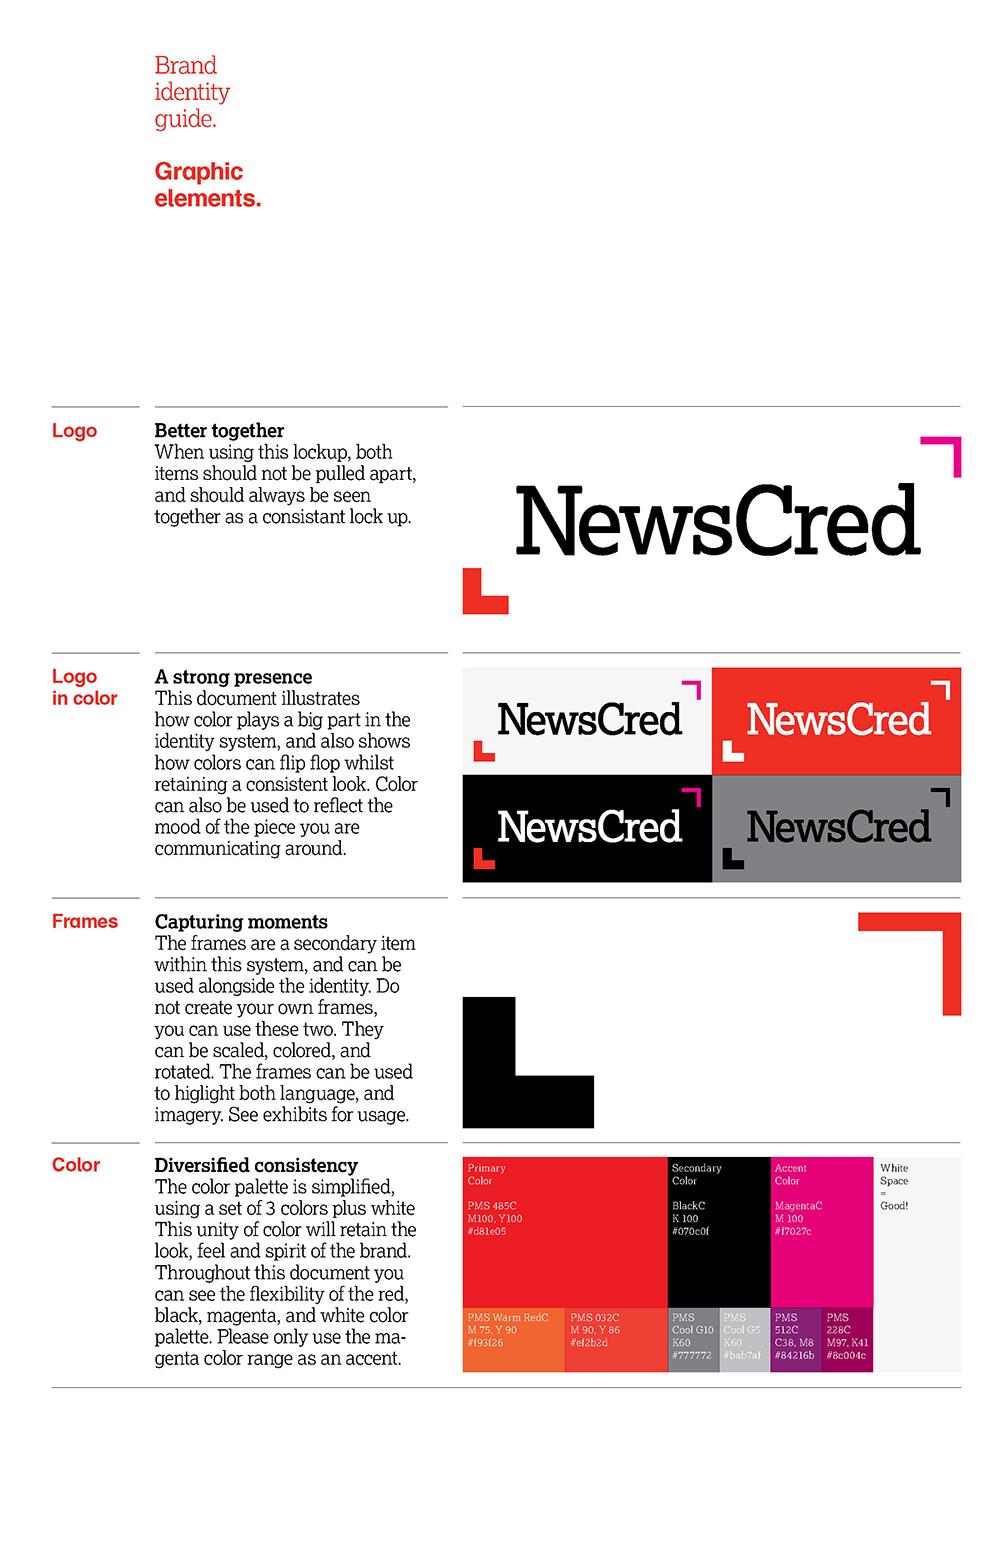 NewsCred_10.jpg